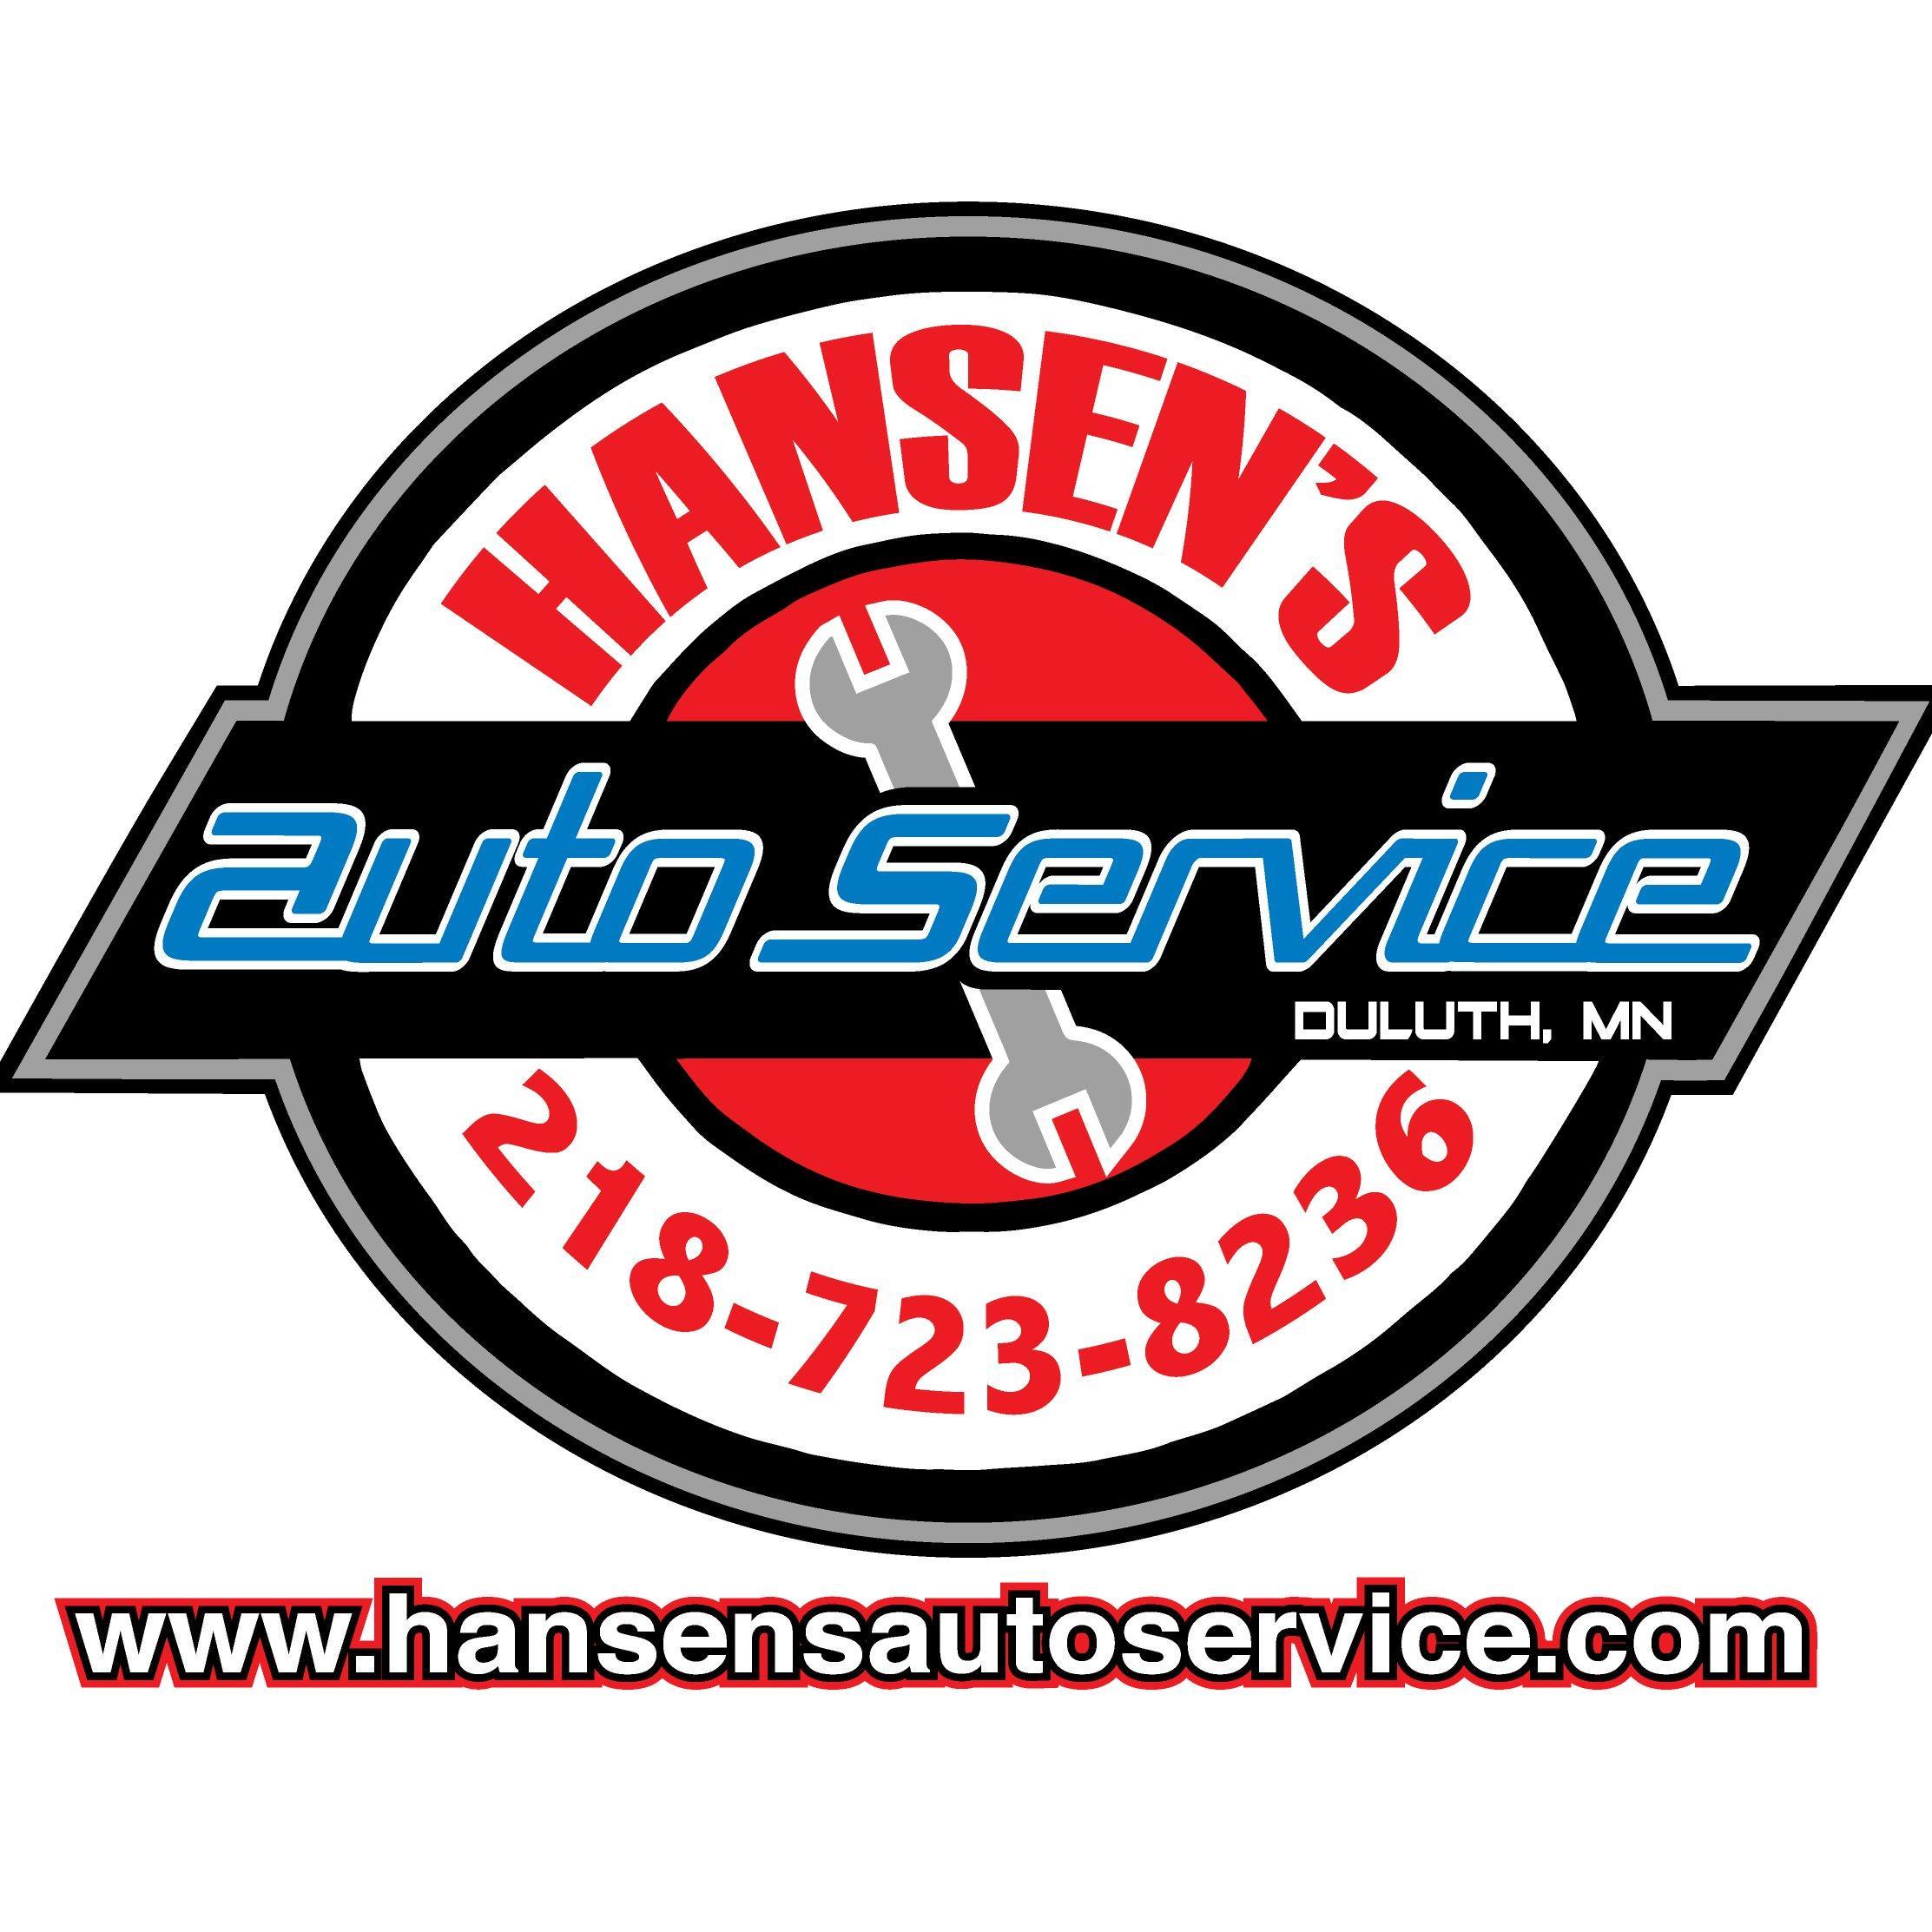 Hansen Auto Service Of Duluth Inc - Duluth, MN - General Auto Repair & Service